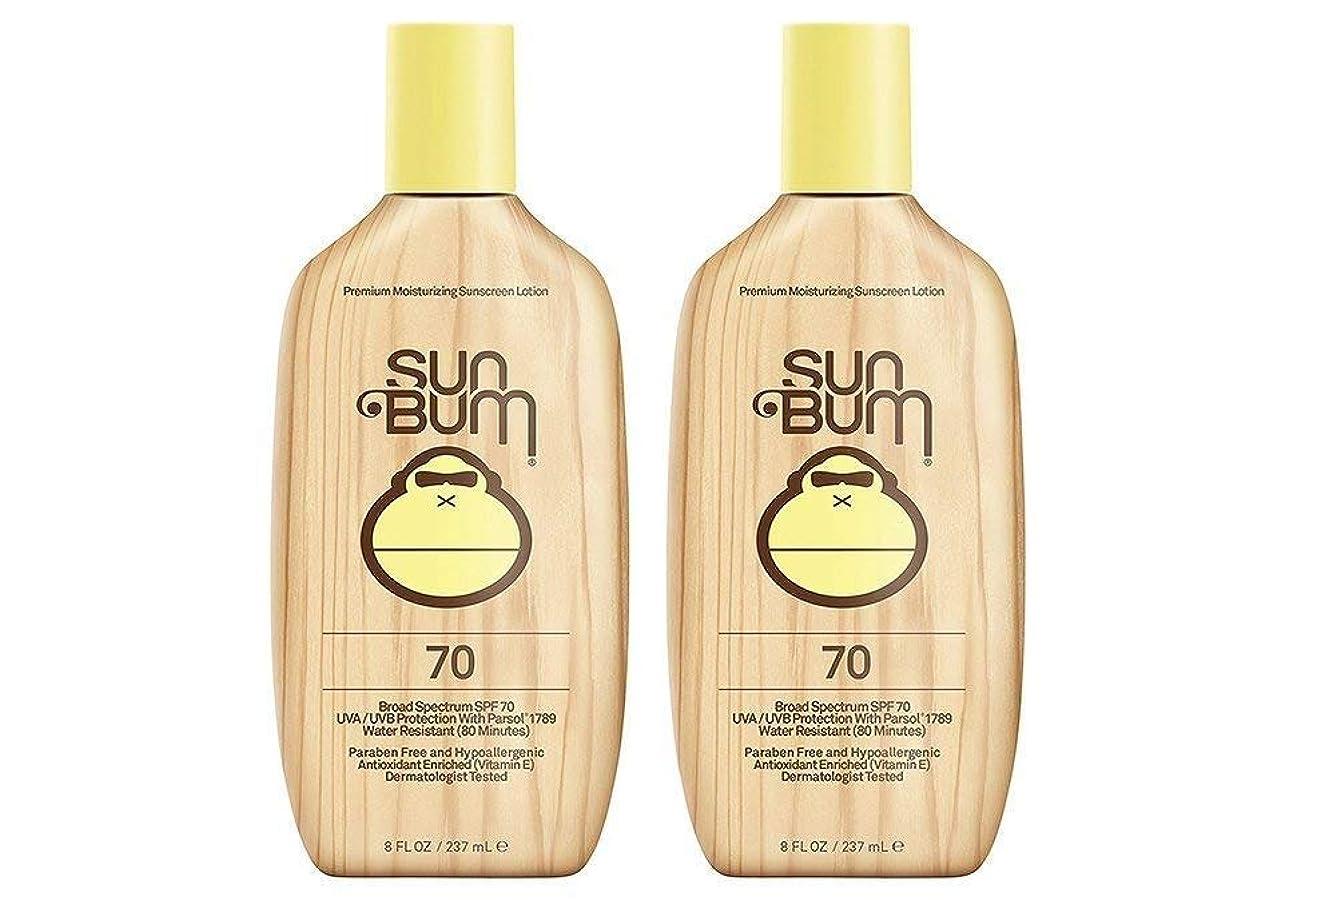 気性文明瞑想Sun Bum SPF 70 Lotion Sunscreen - by Sun Bum